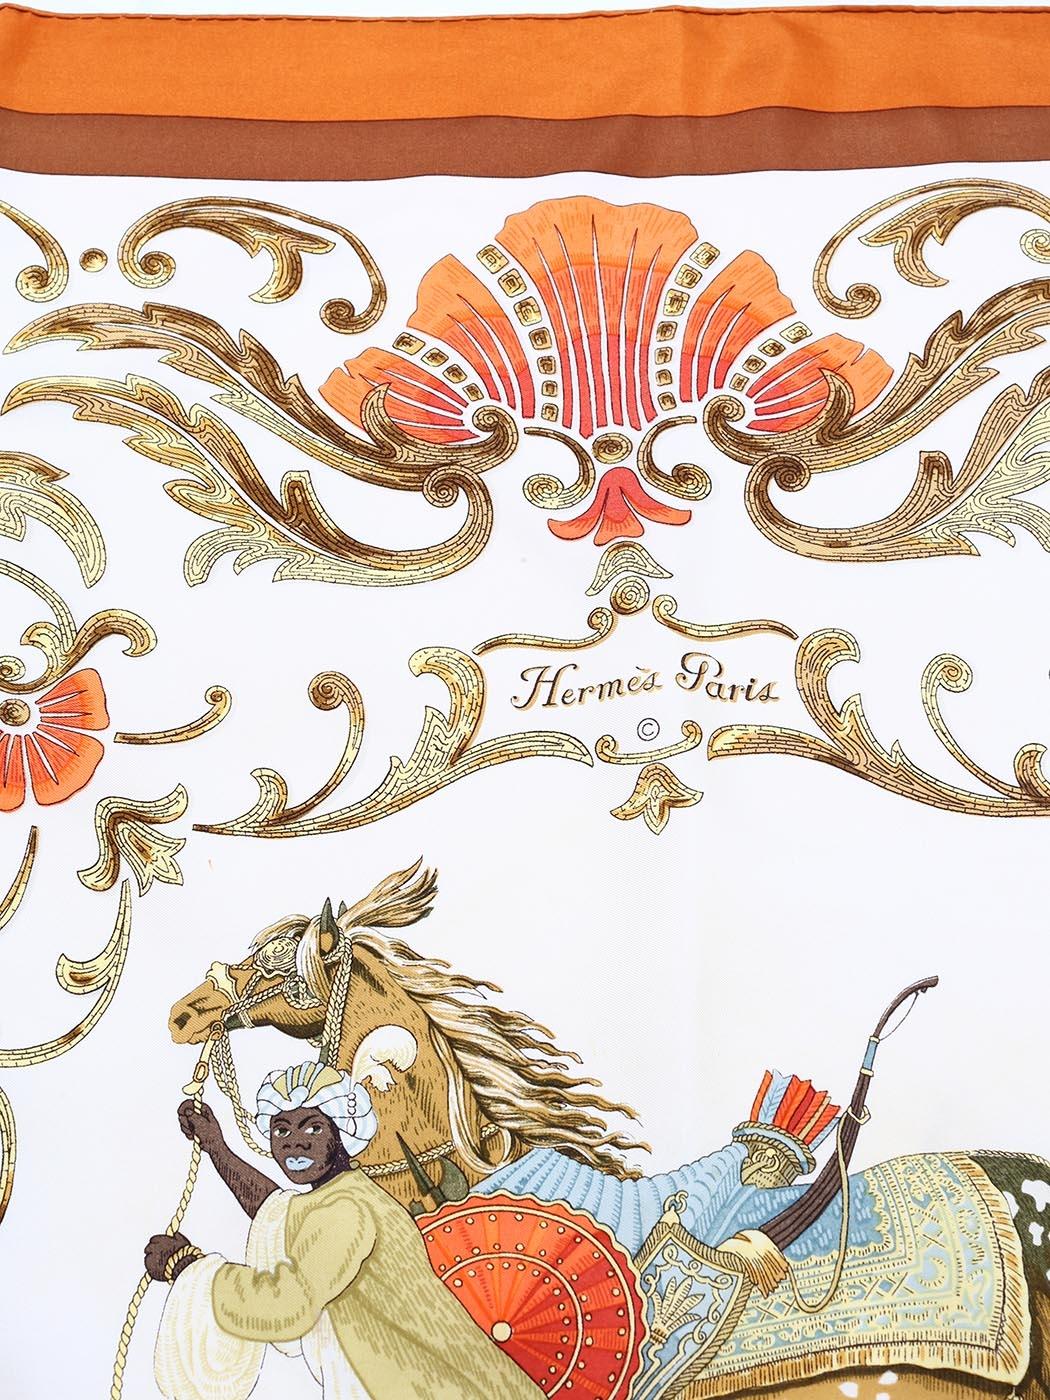 ... CHEVAL TURC printed silk twill square scarf Retail price €350 Size 90 x  90 ... 567d4f72db0